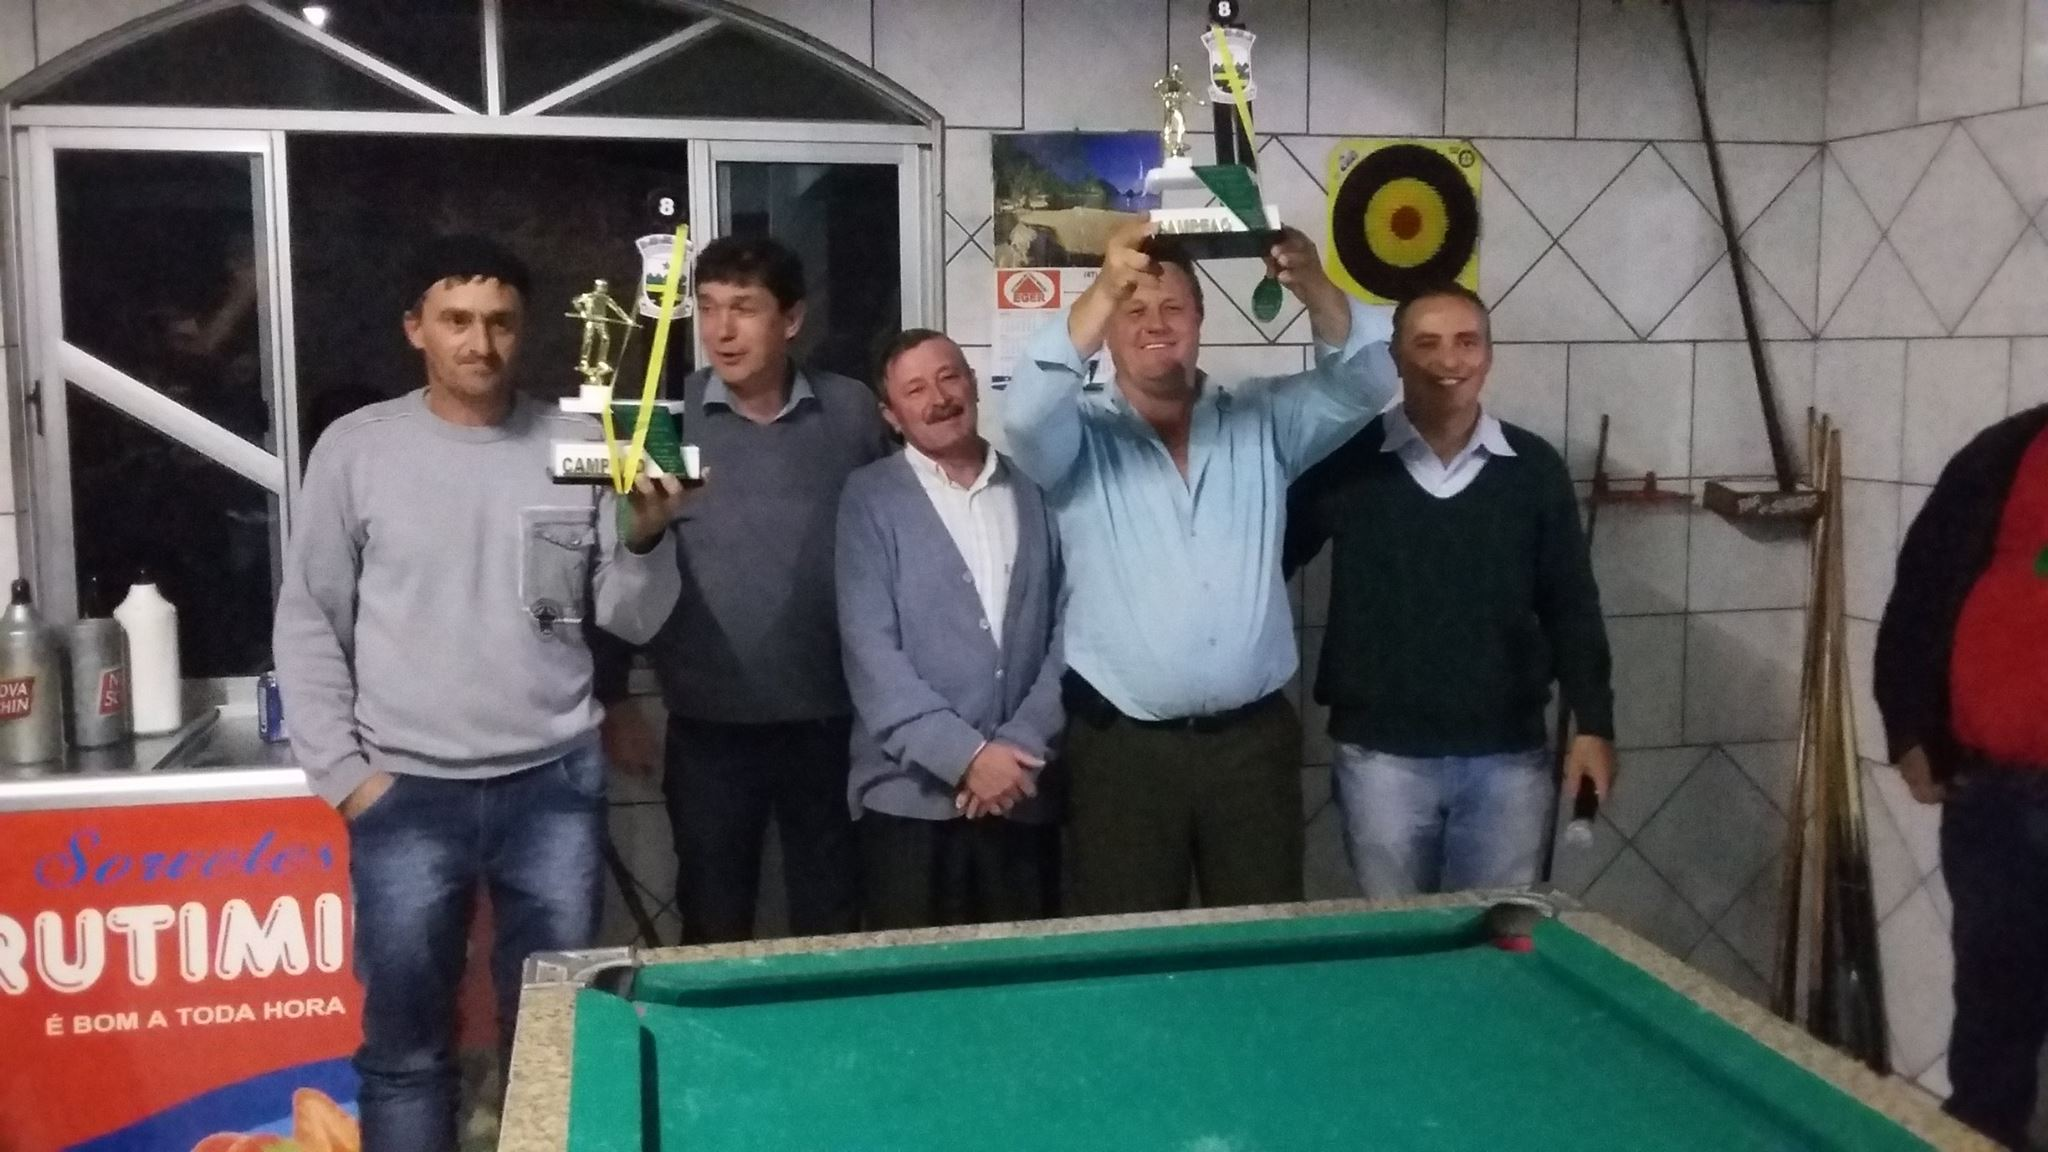 Campeonato Municipal de Sinuca de Petrolândia chega ao fim